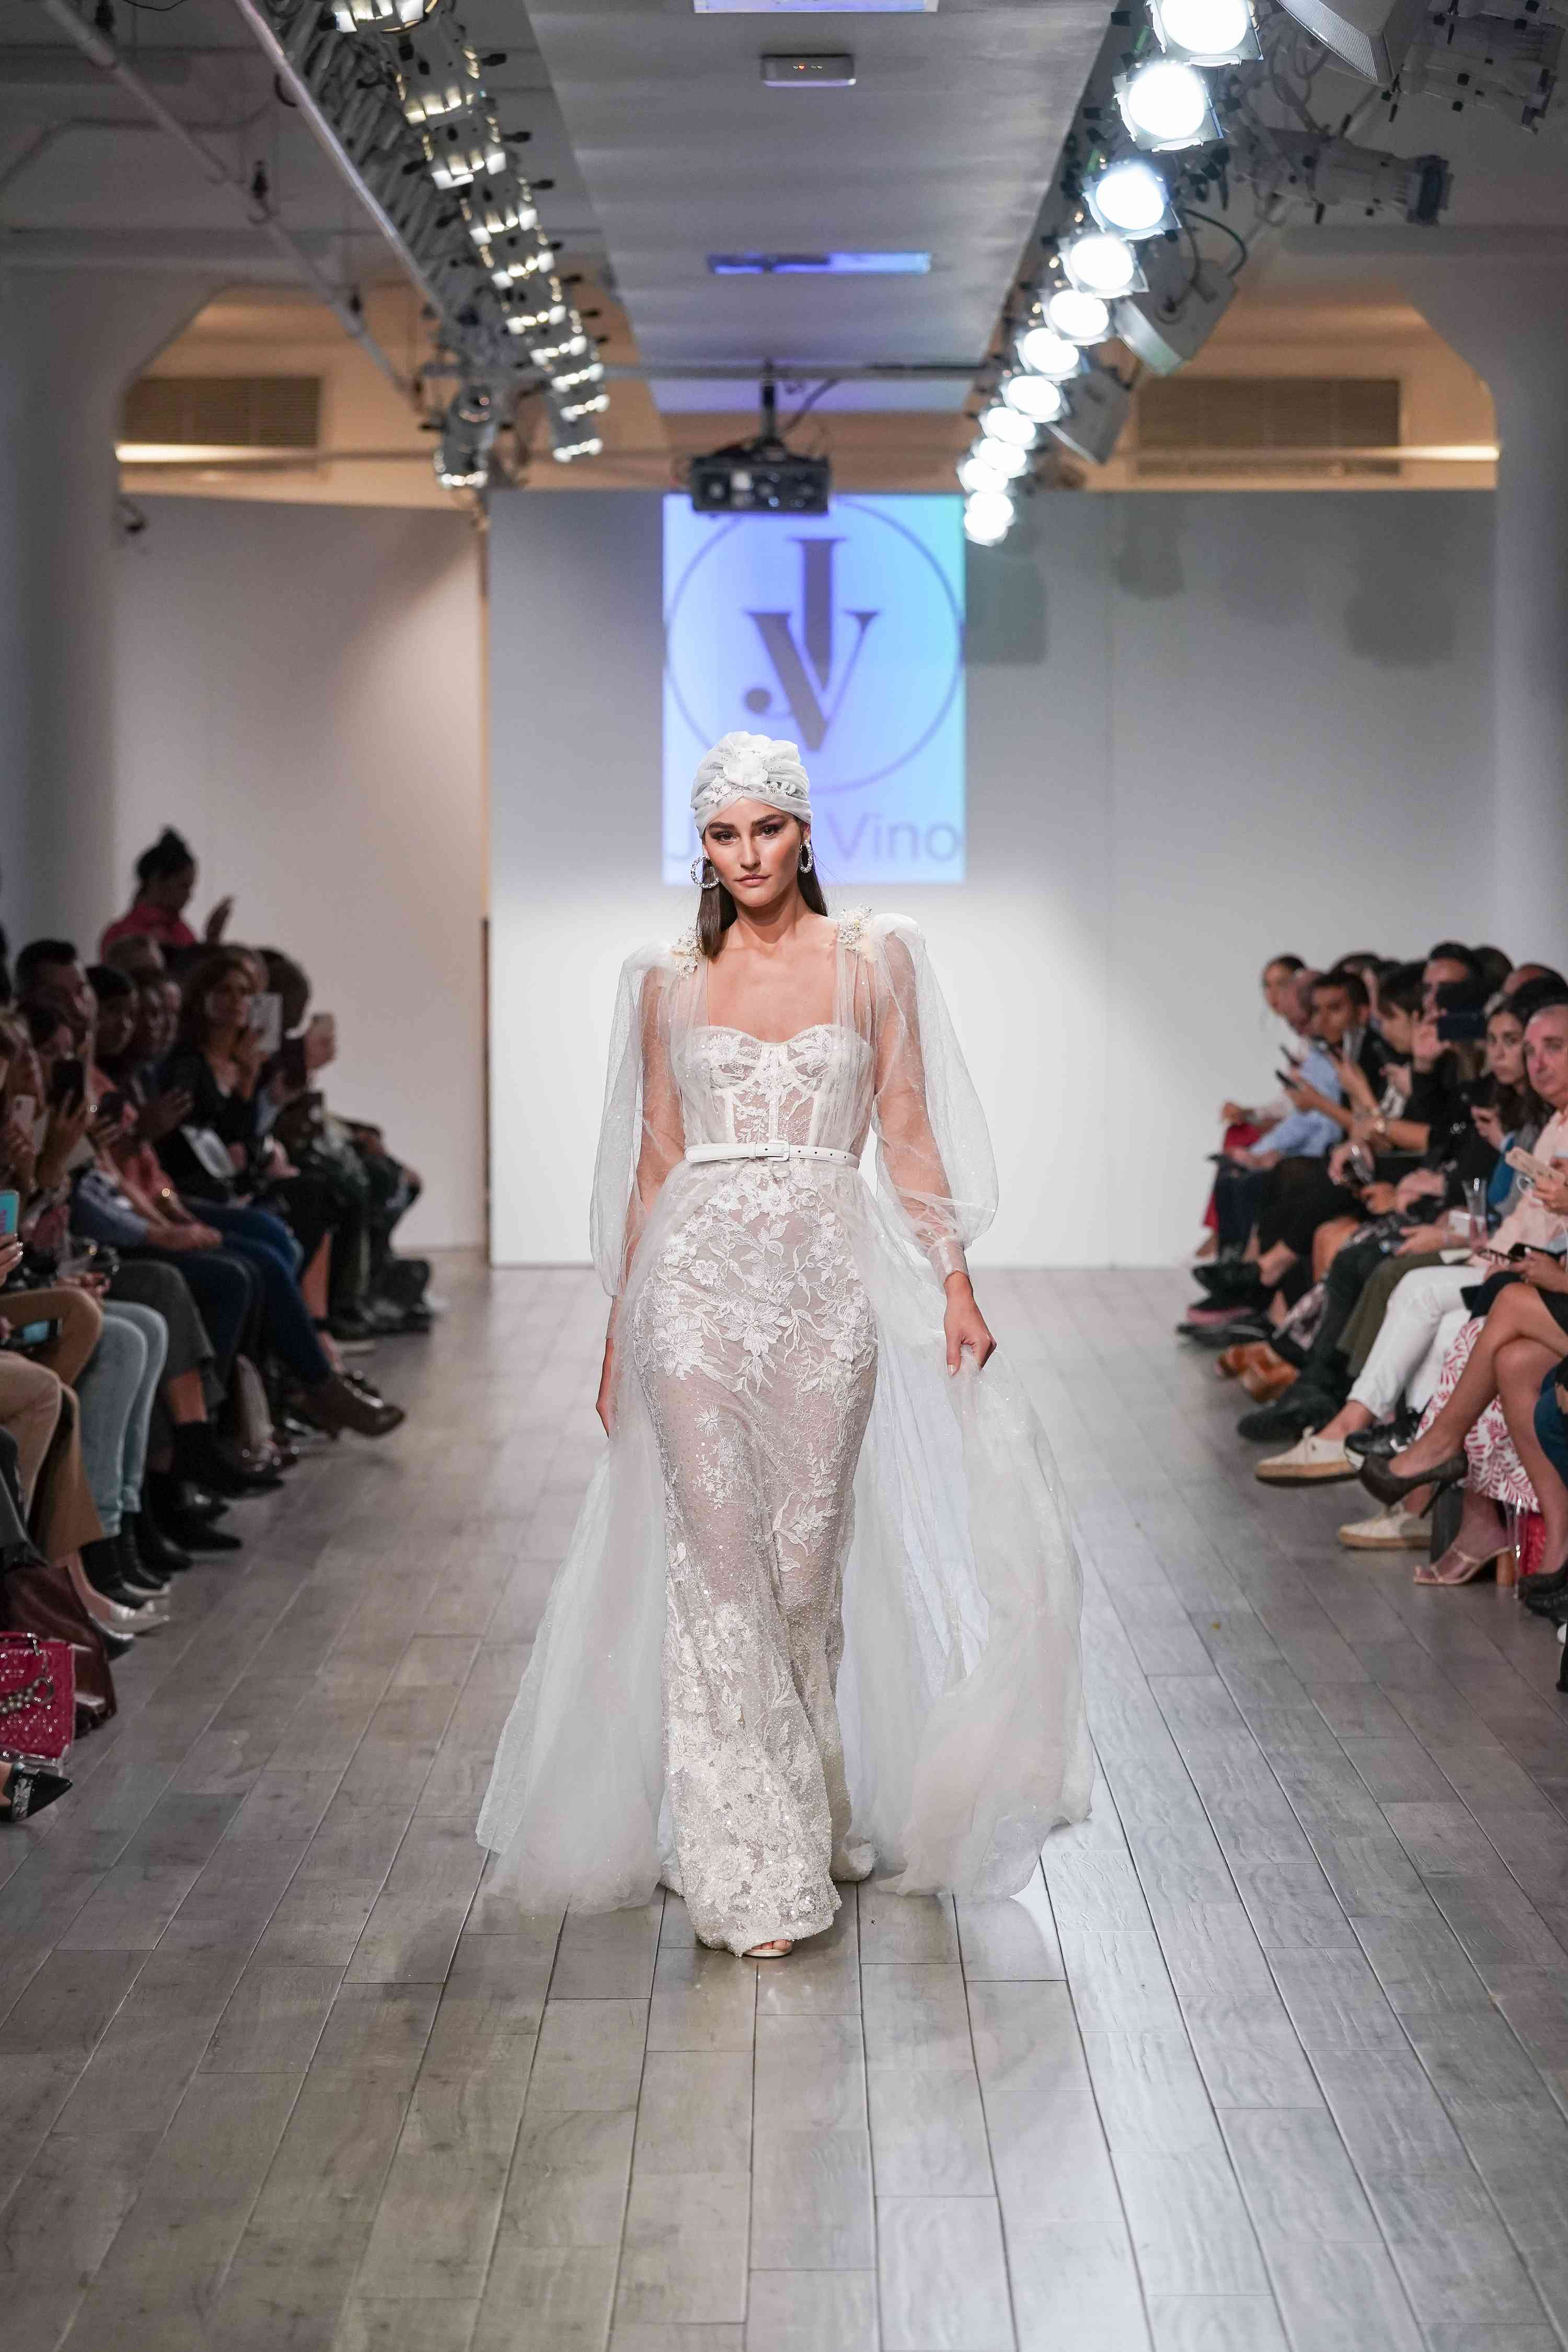 Model in corseted full sleeve wedding dress